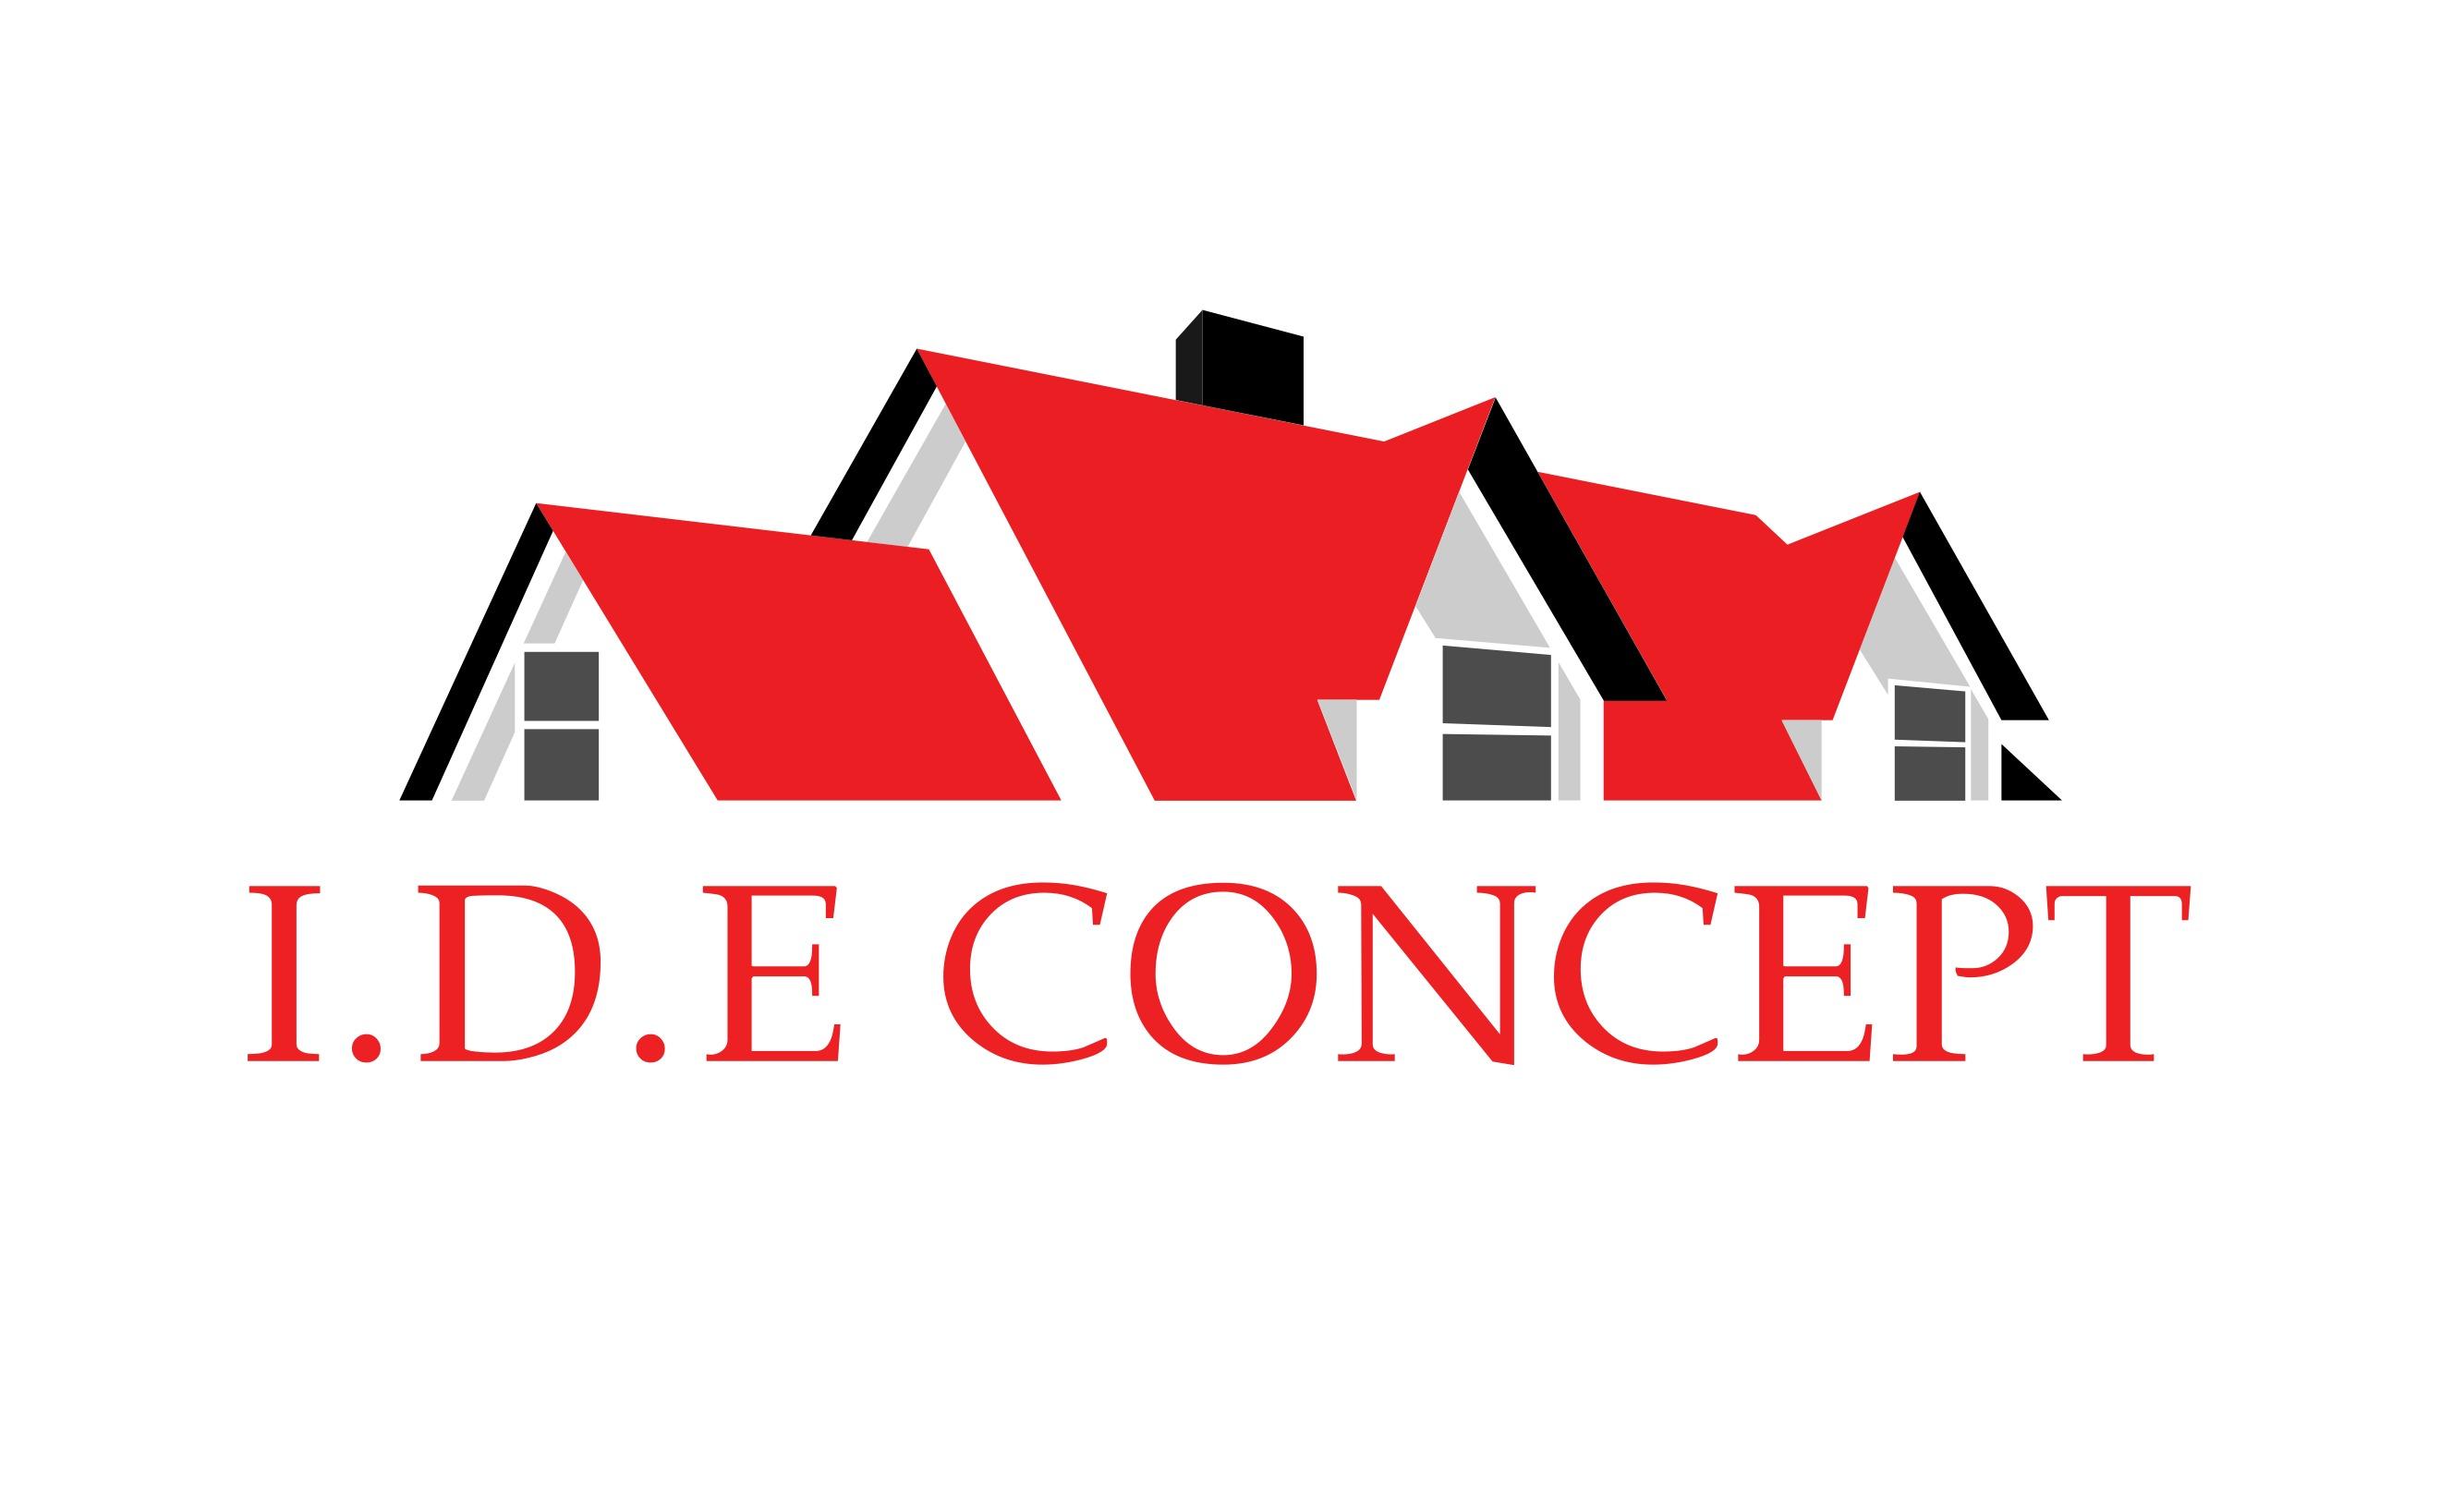 I.D.E CONCEPT